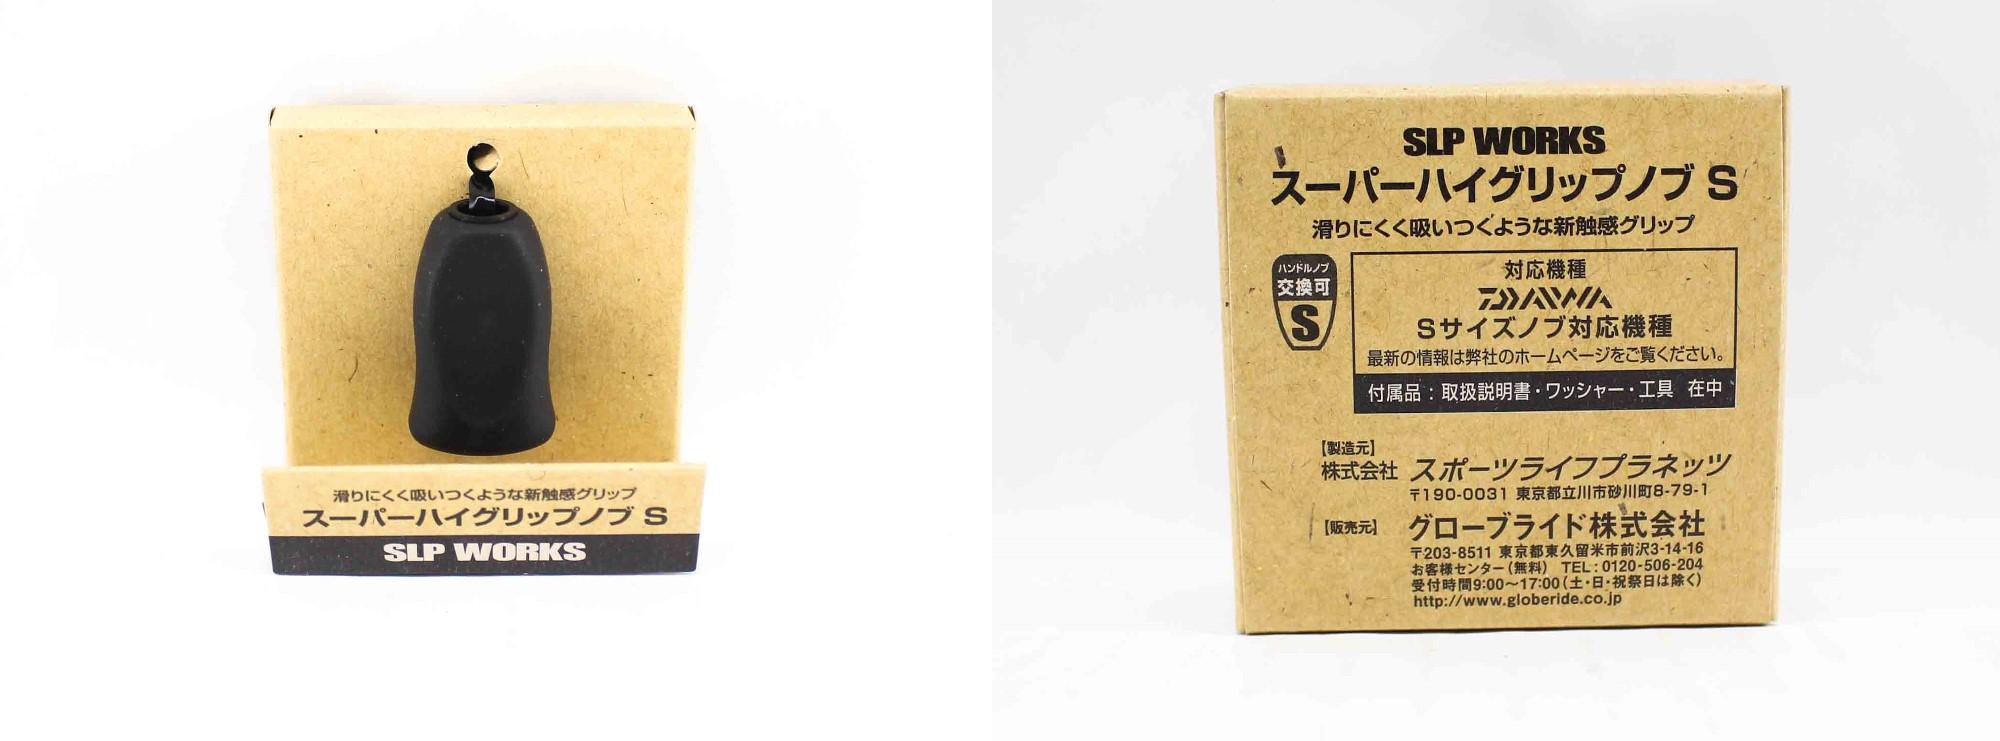 Daiwa SLPW S High Grip Handle Knob Black (0849)